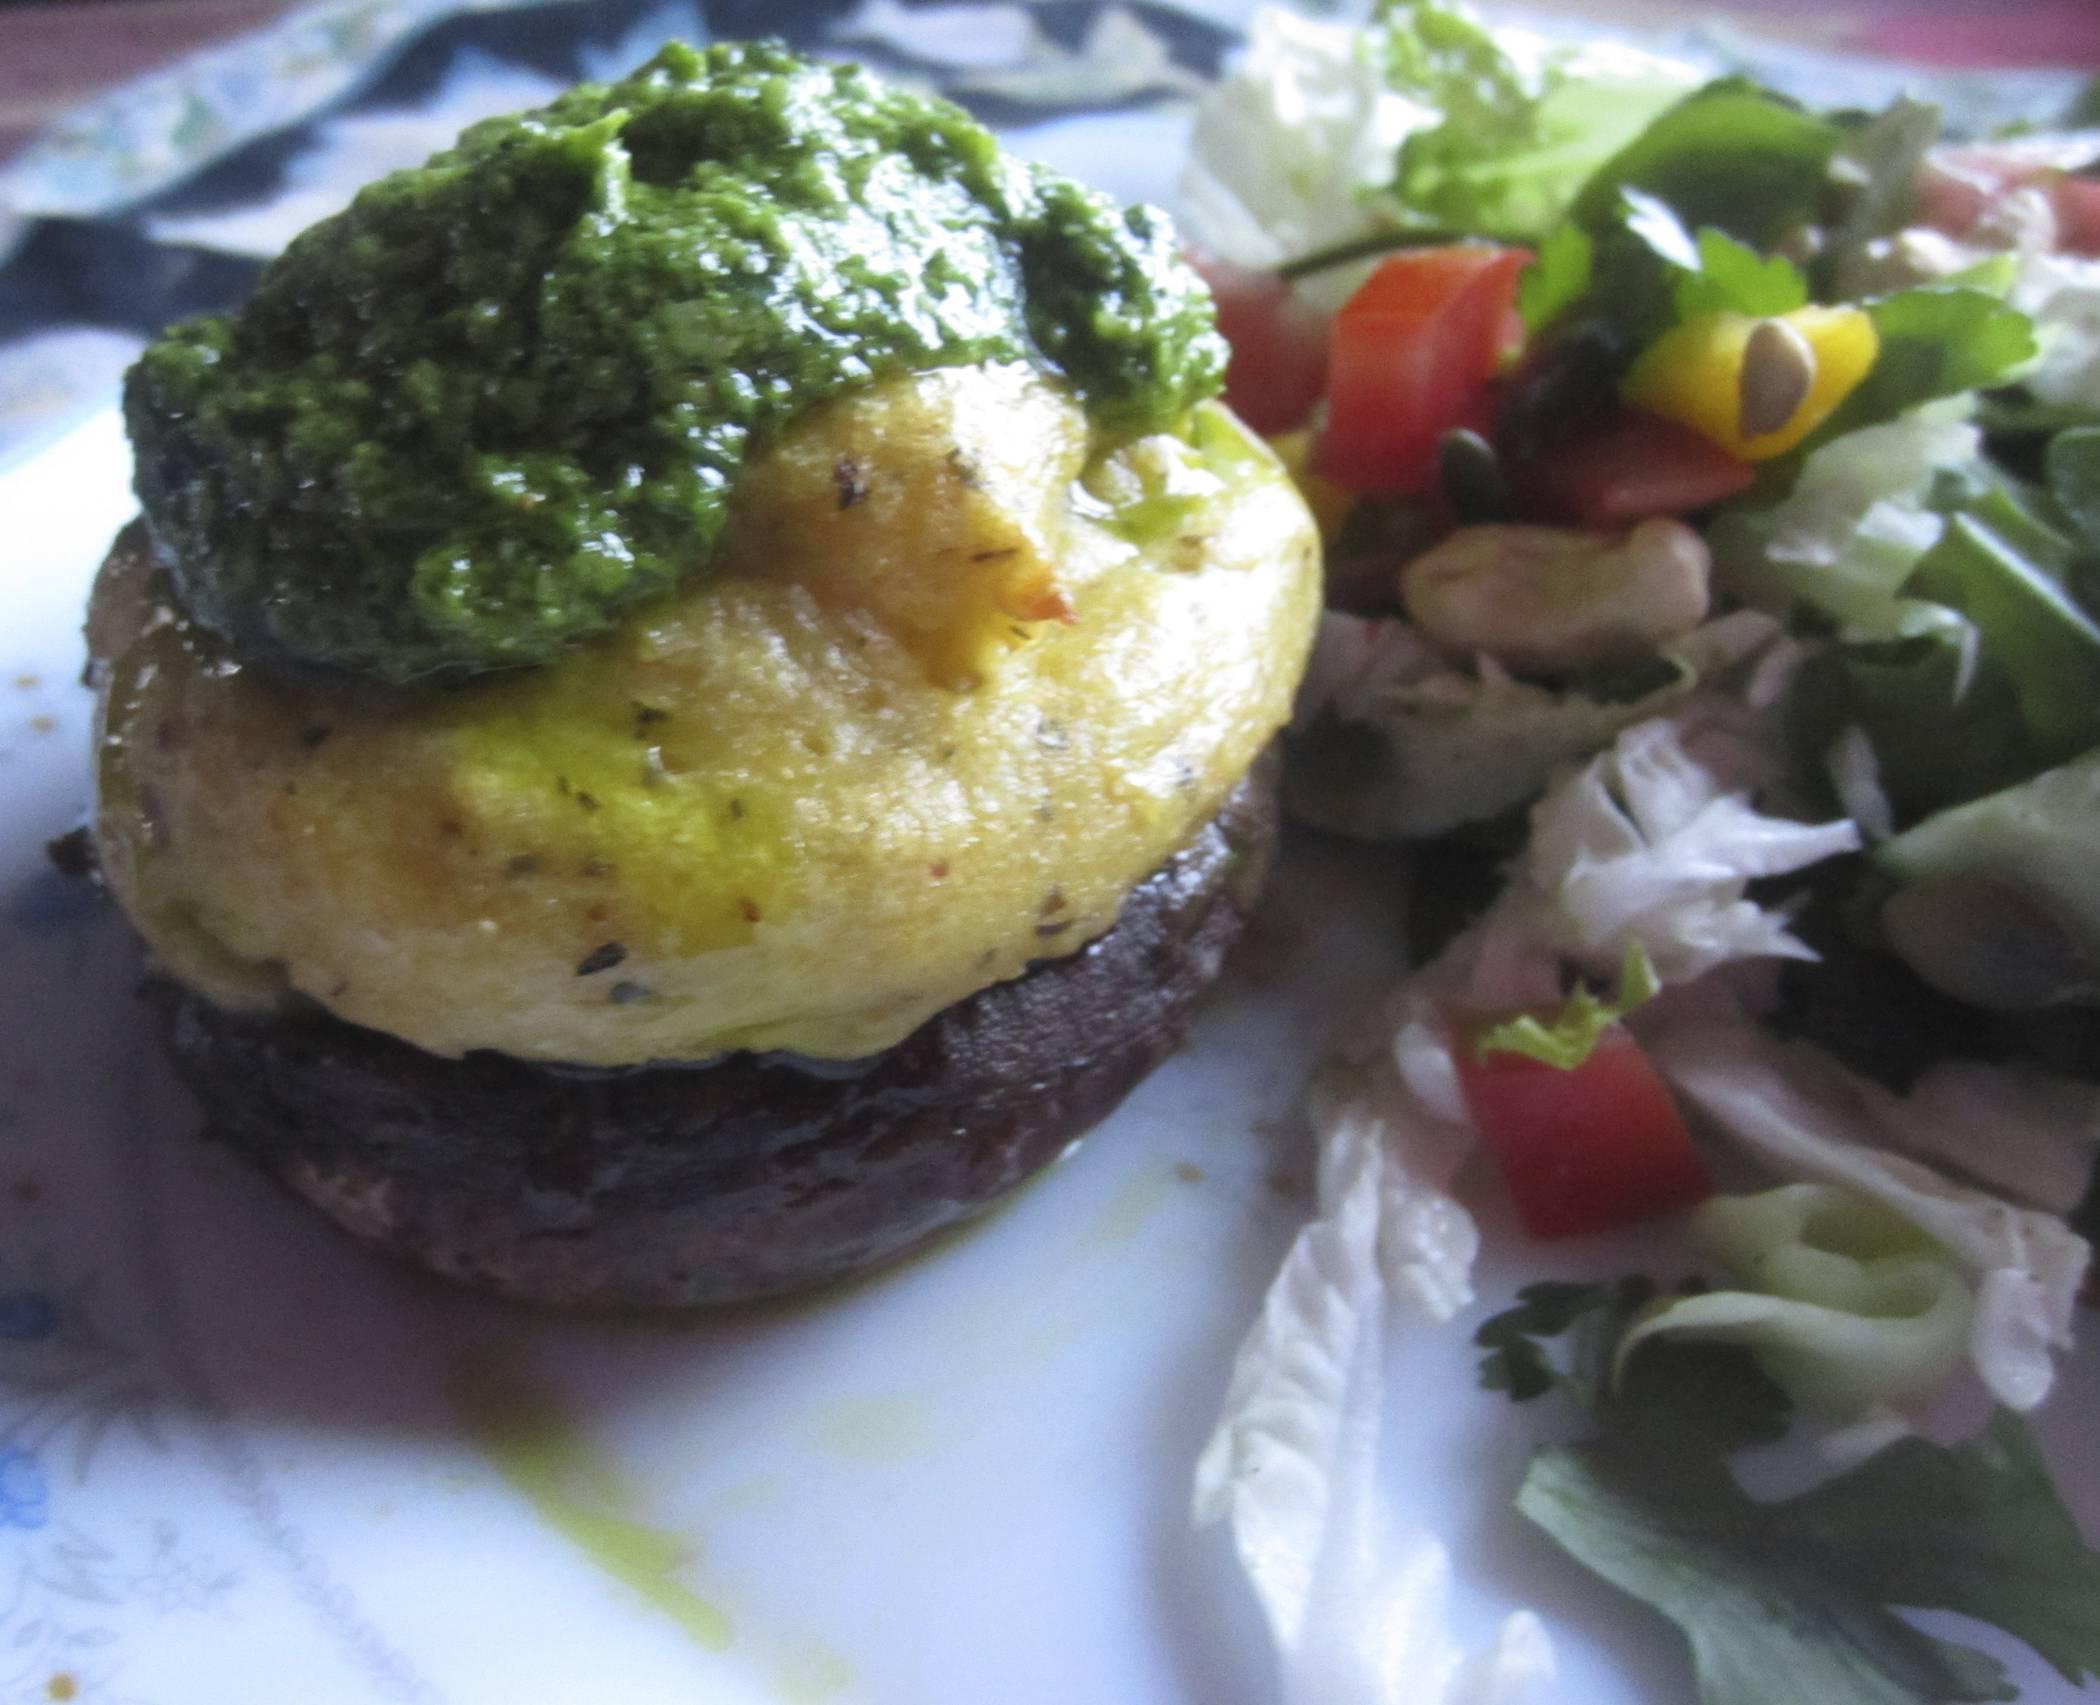 Portobello mushrooms with Polenta and Wild Garlic Pesto